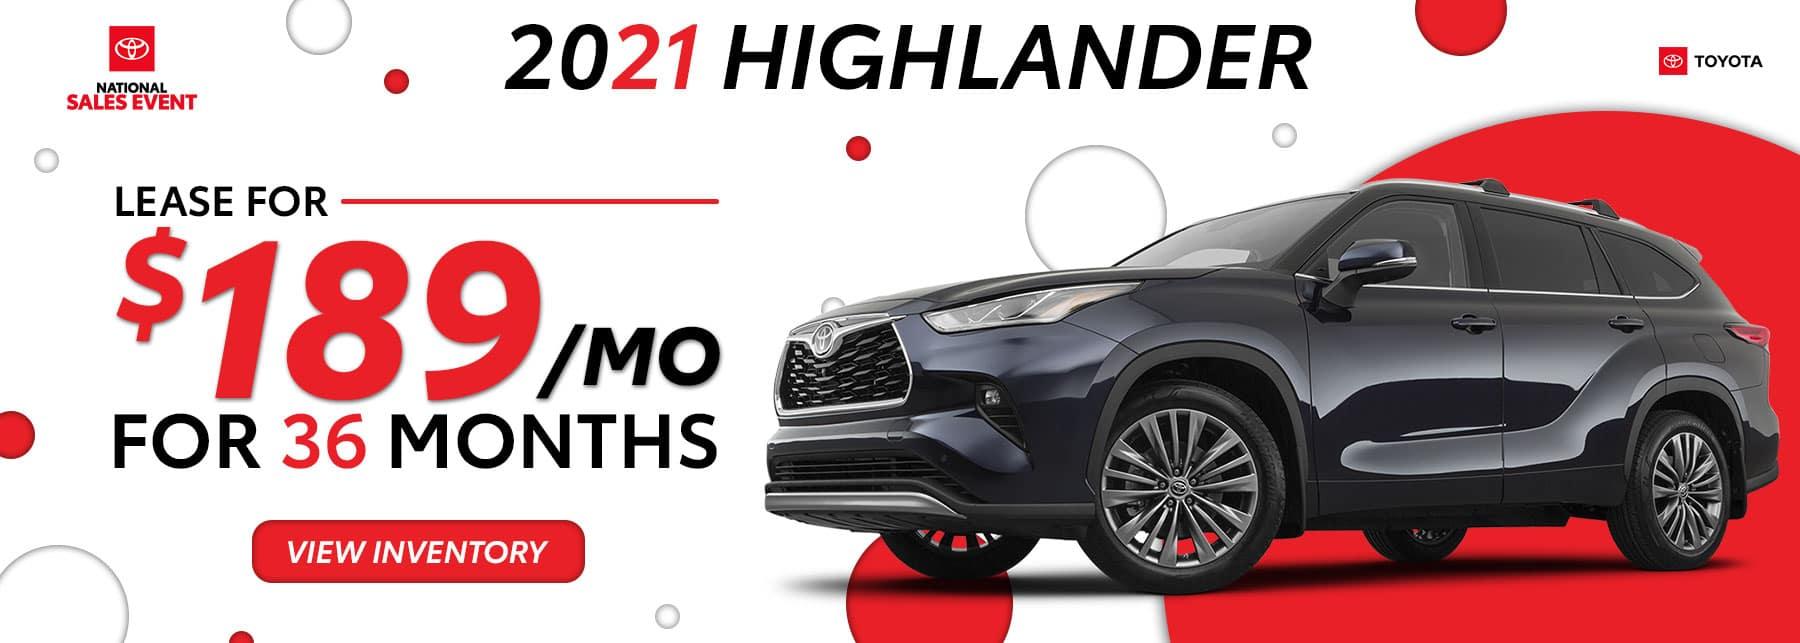 Toyota Highlander August Offers